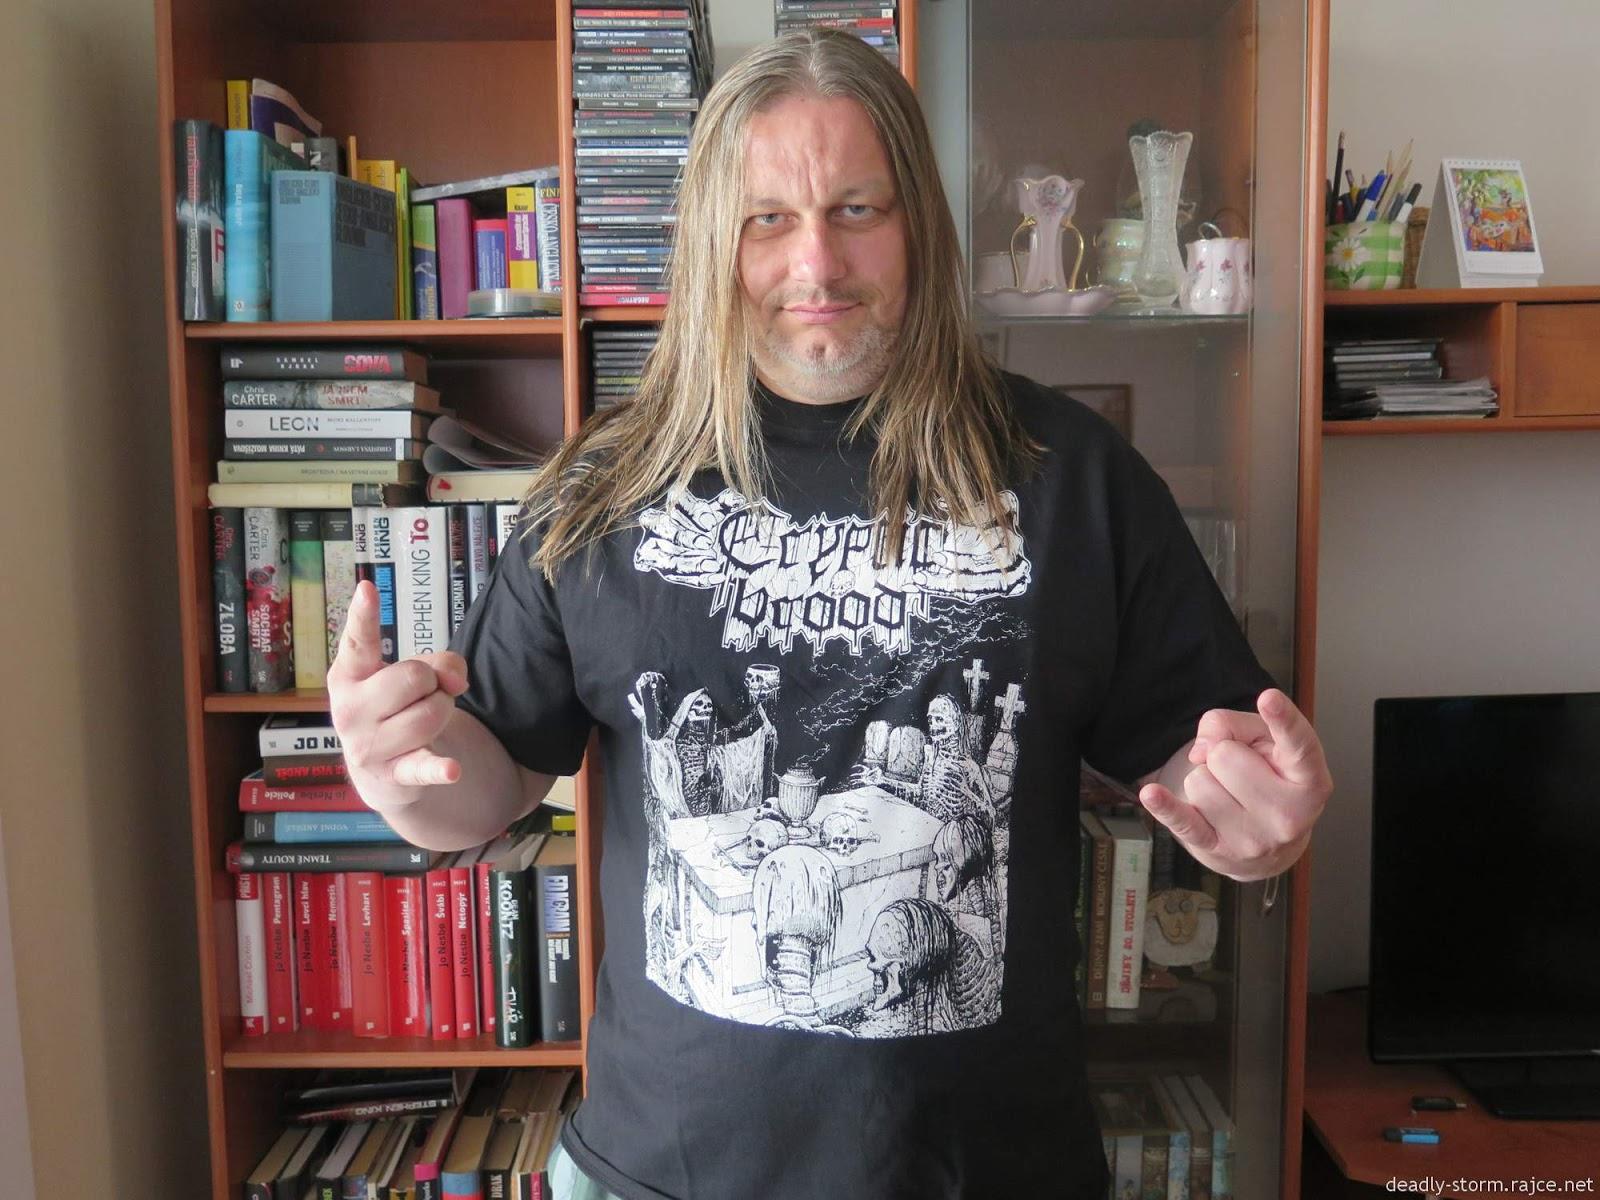 60e63a18d Příběh devadesátý pátý - Brněnský výlet za thrashovými bohy METALLICA.